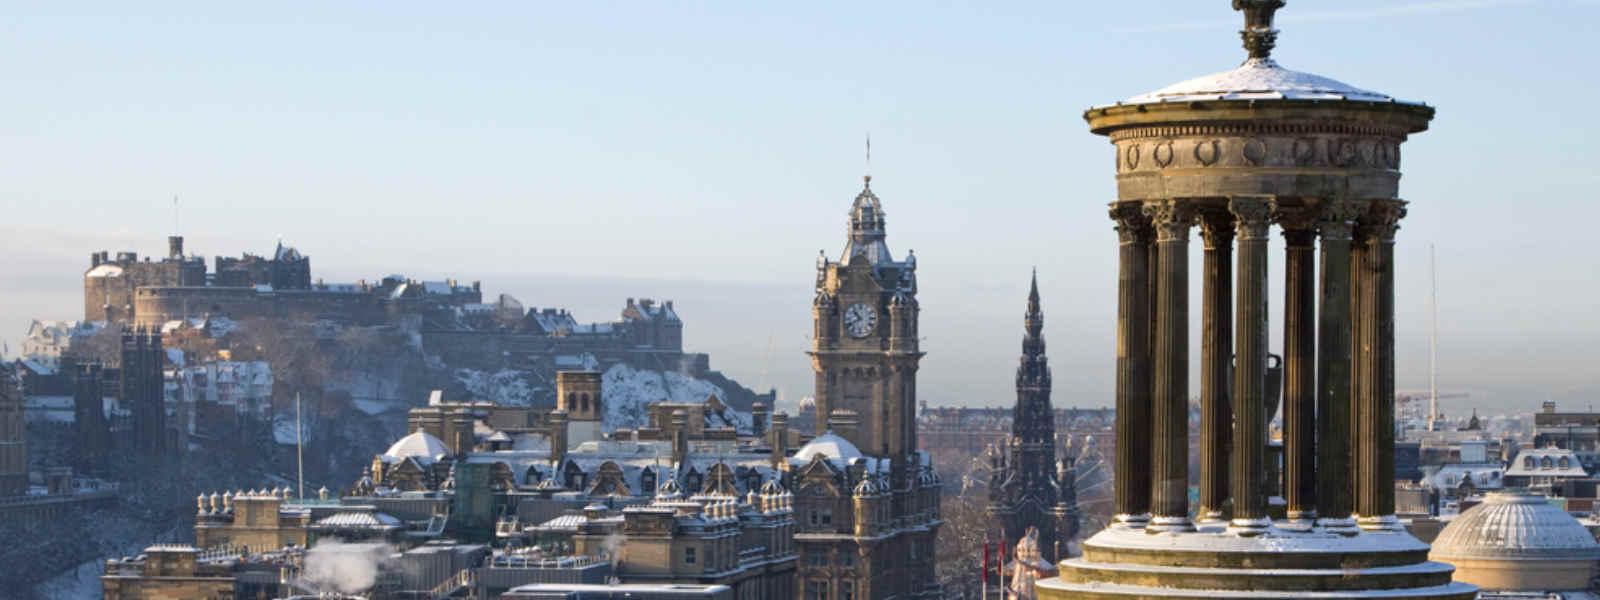 Edinburgh skyline covered in snow seen from Calton Hill